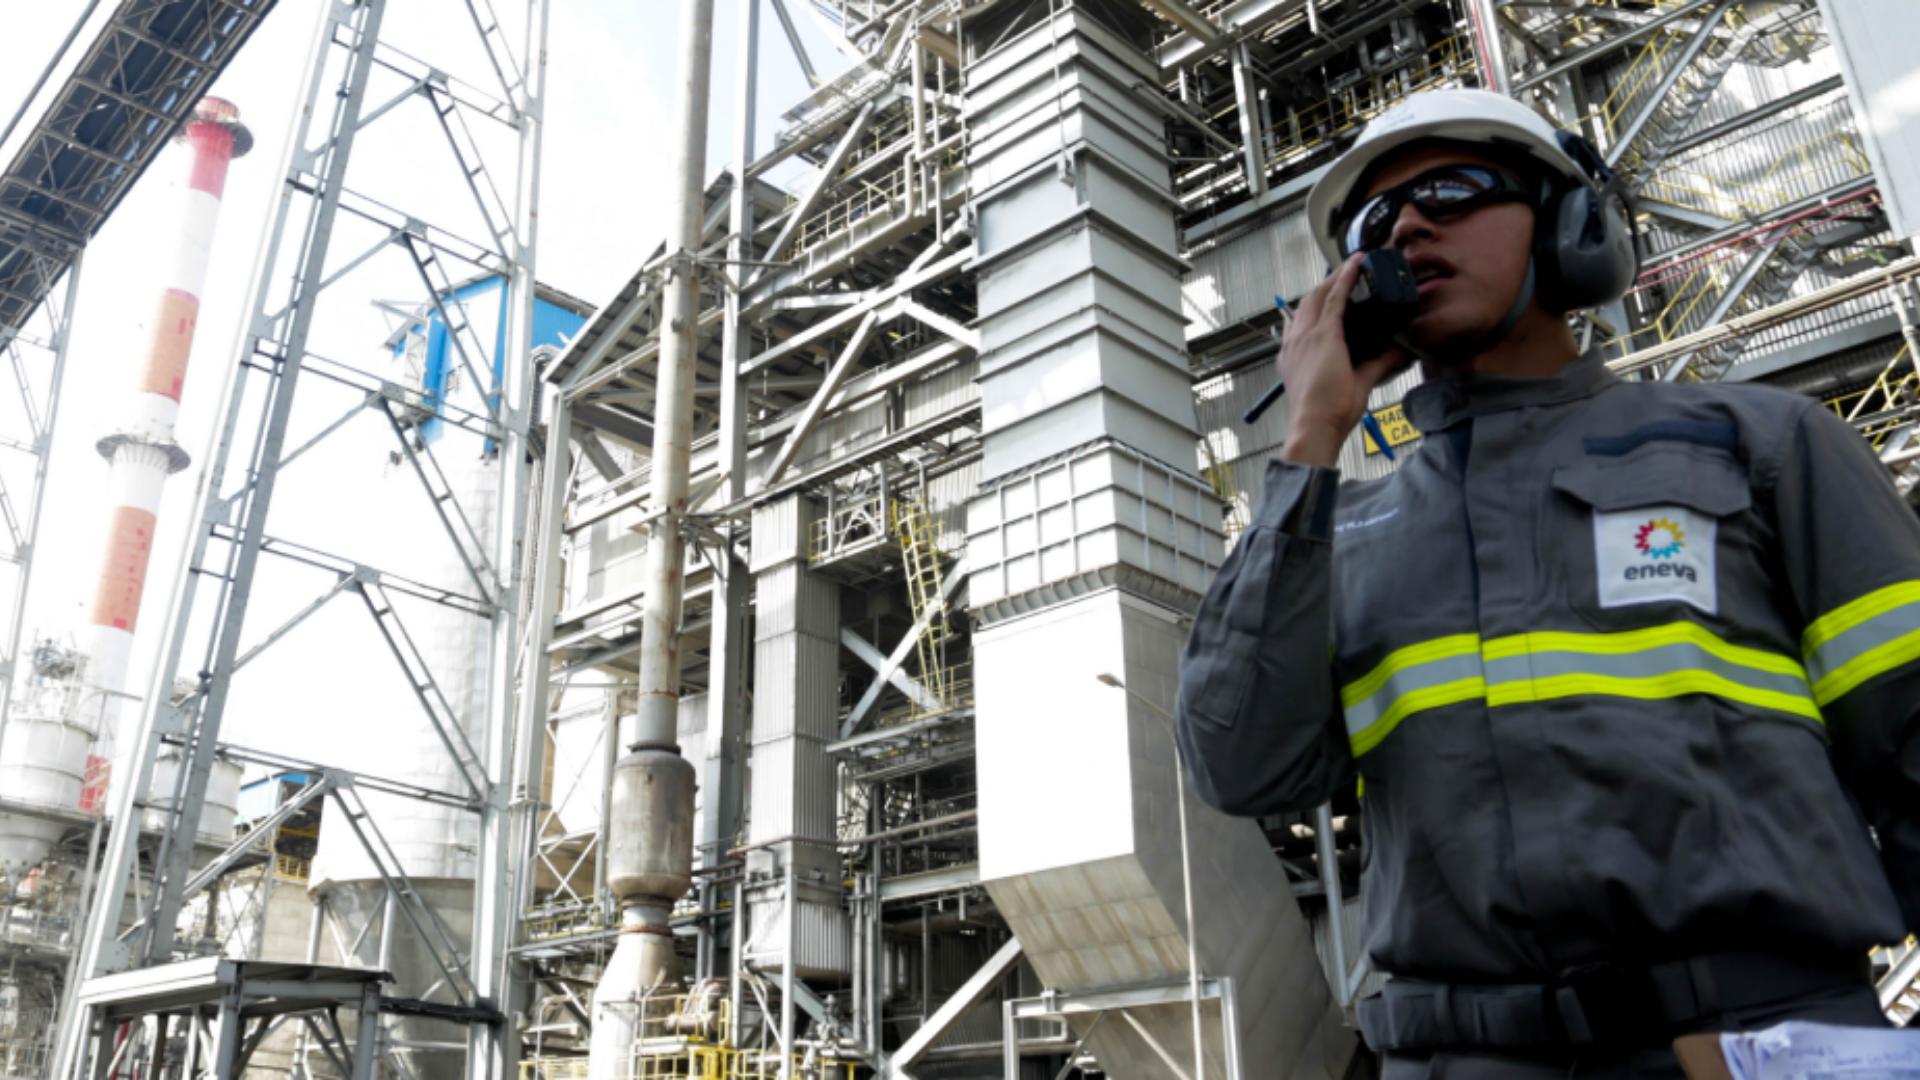 Emprego – energia – estágio - Eneva